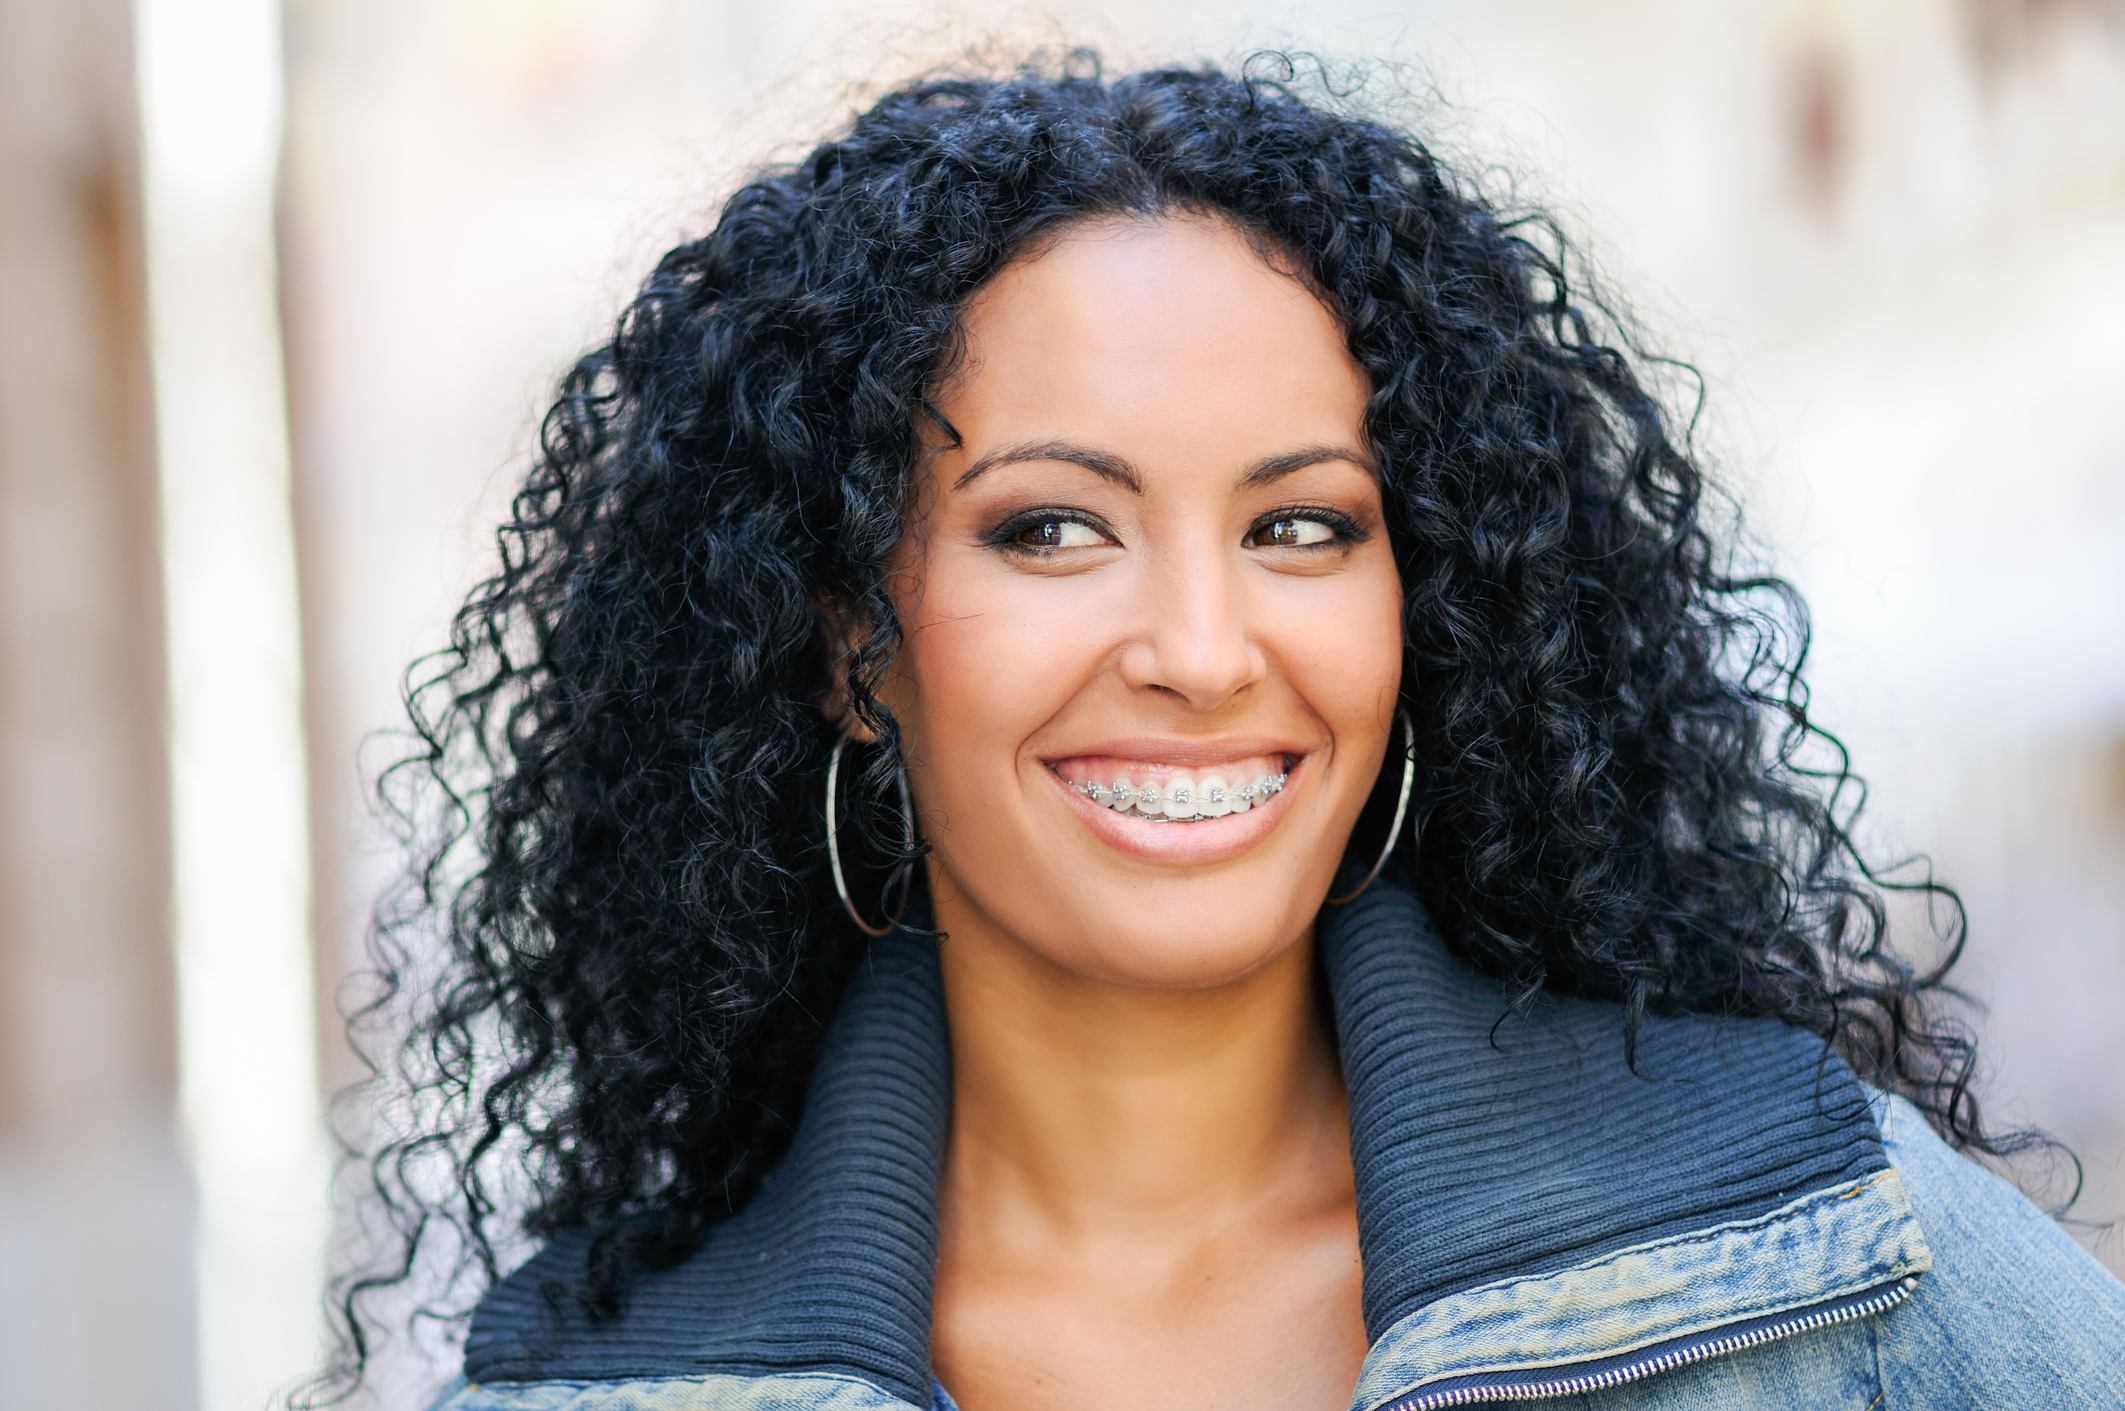 como matizar o cabelo preto - Como matizar o cabelo preto e evitar o desbotamento?